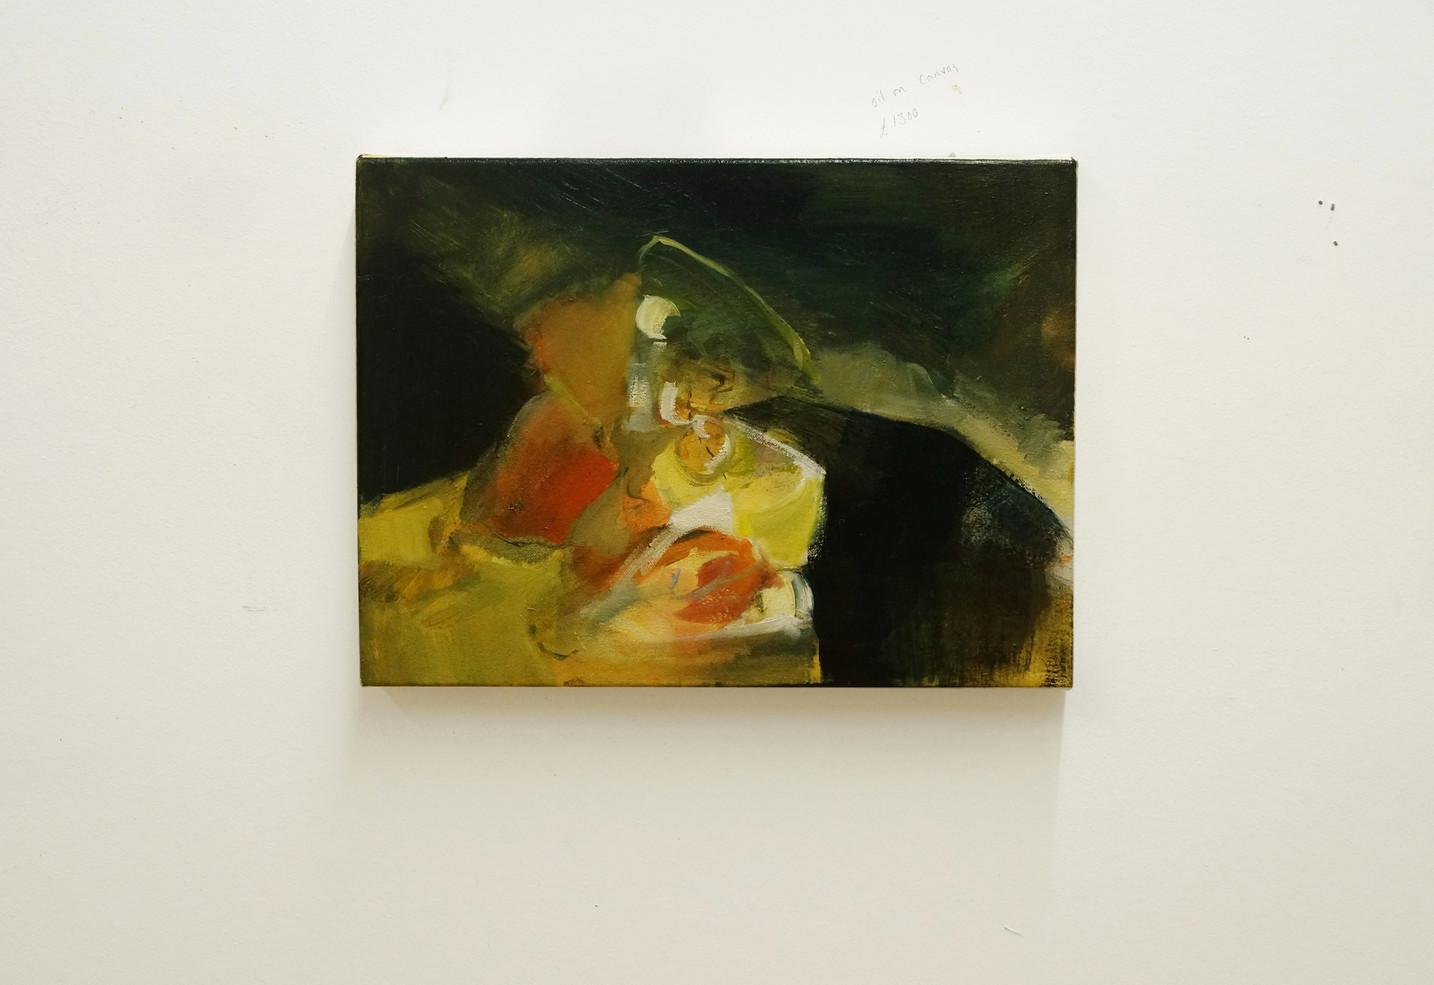 Oil on canvas 40.5x30.5cm